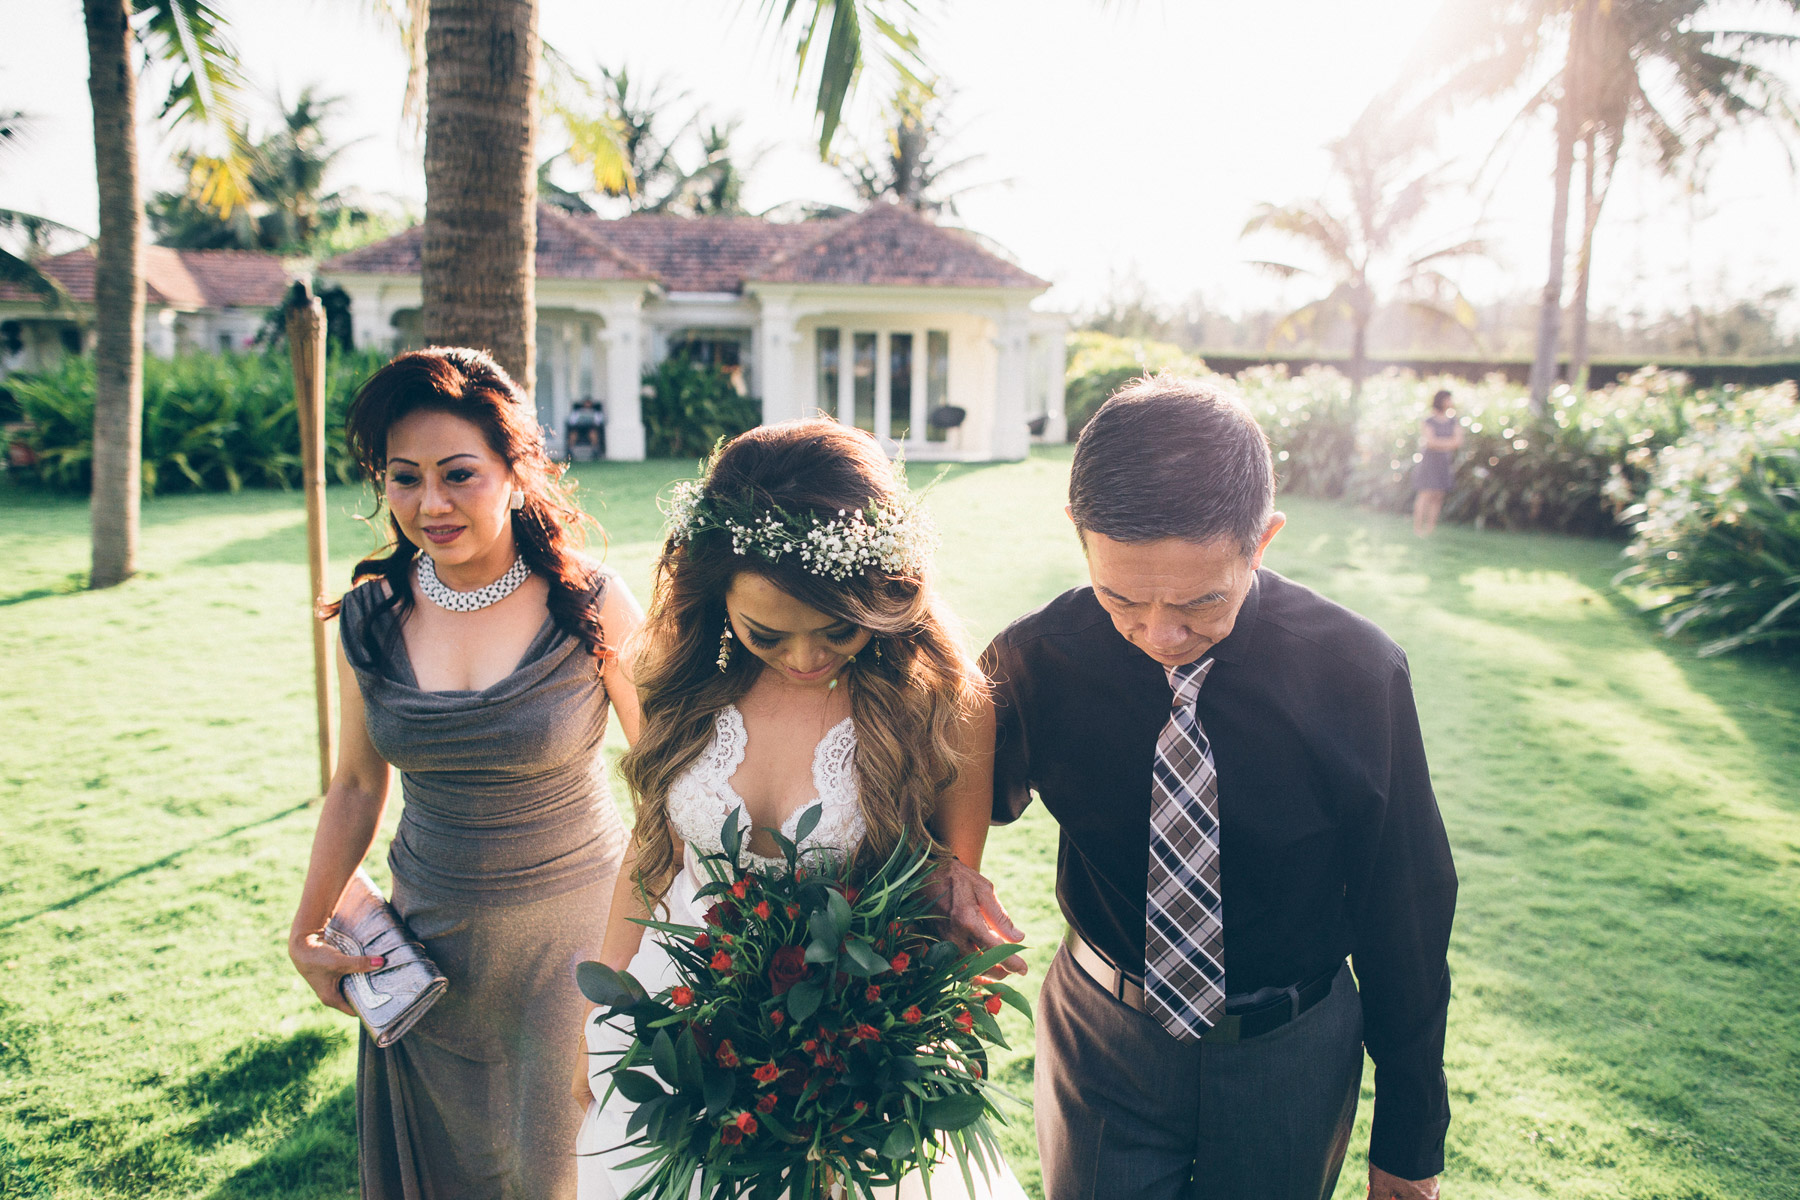 Southeast-Asia-Destination-Wedding-Photography-2